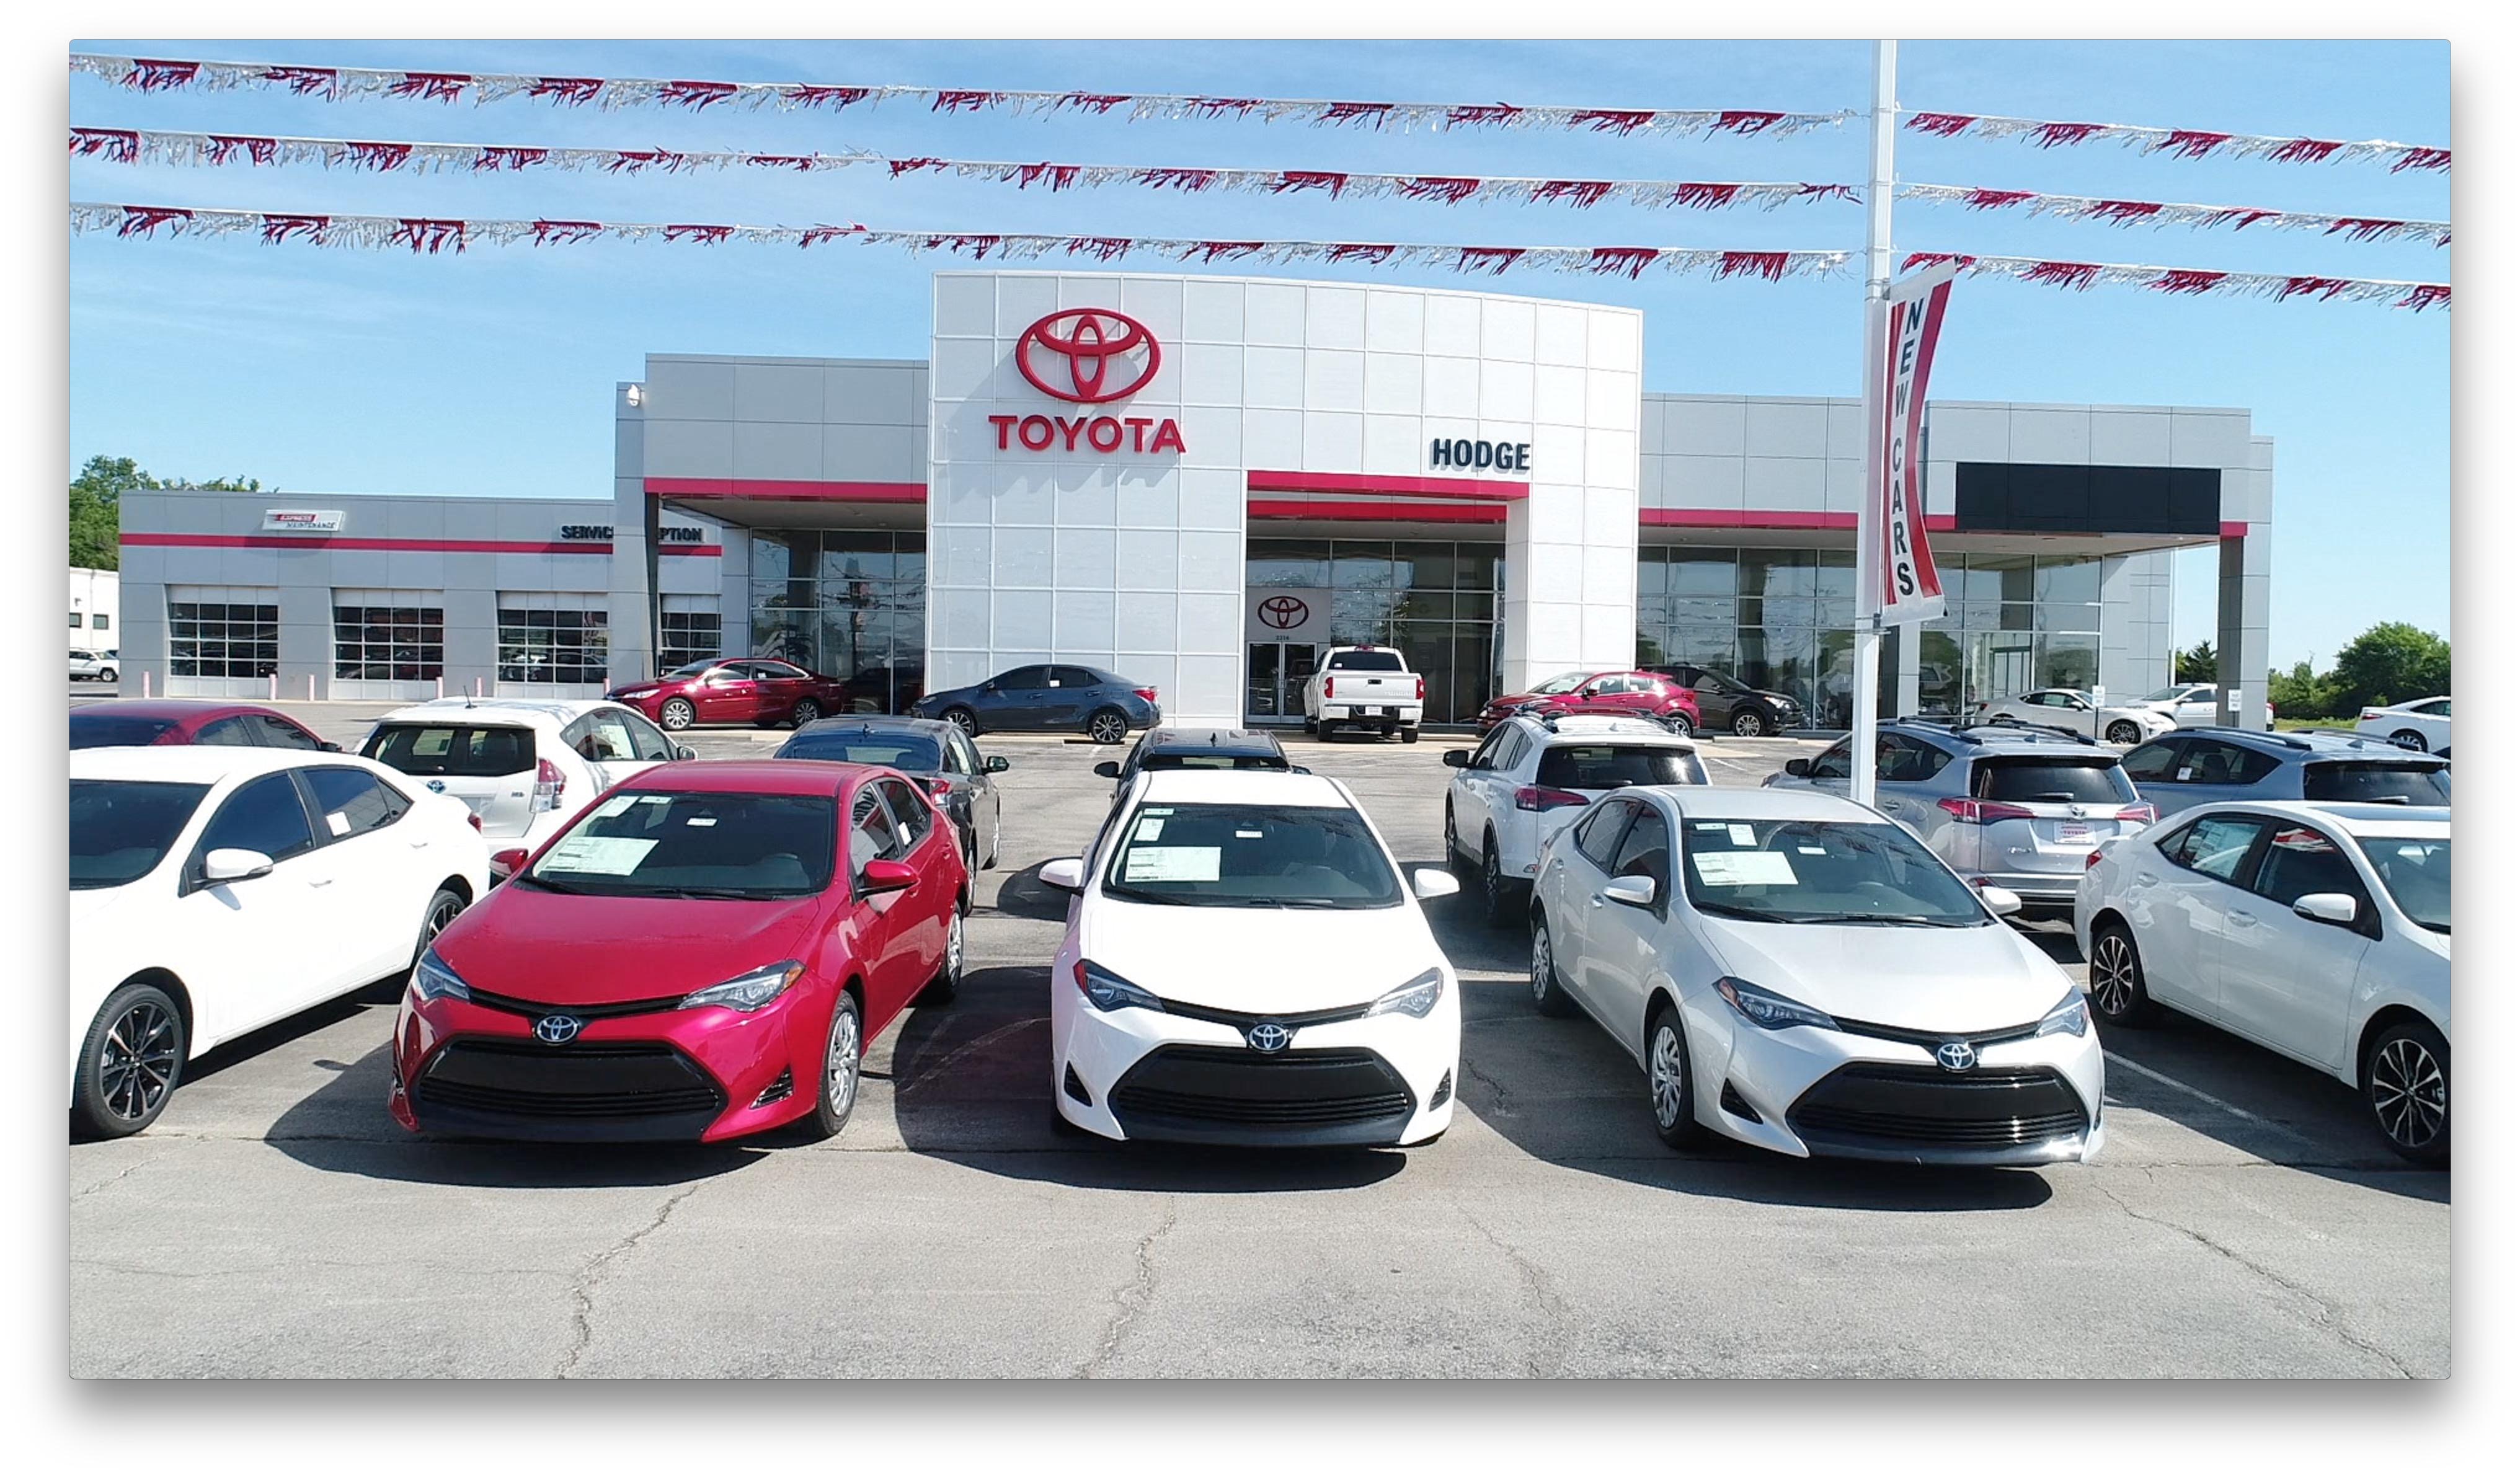 James Hodge Toyota Dealership Lot